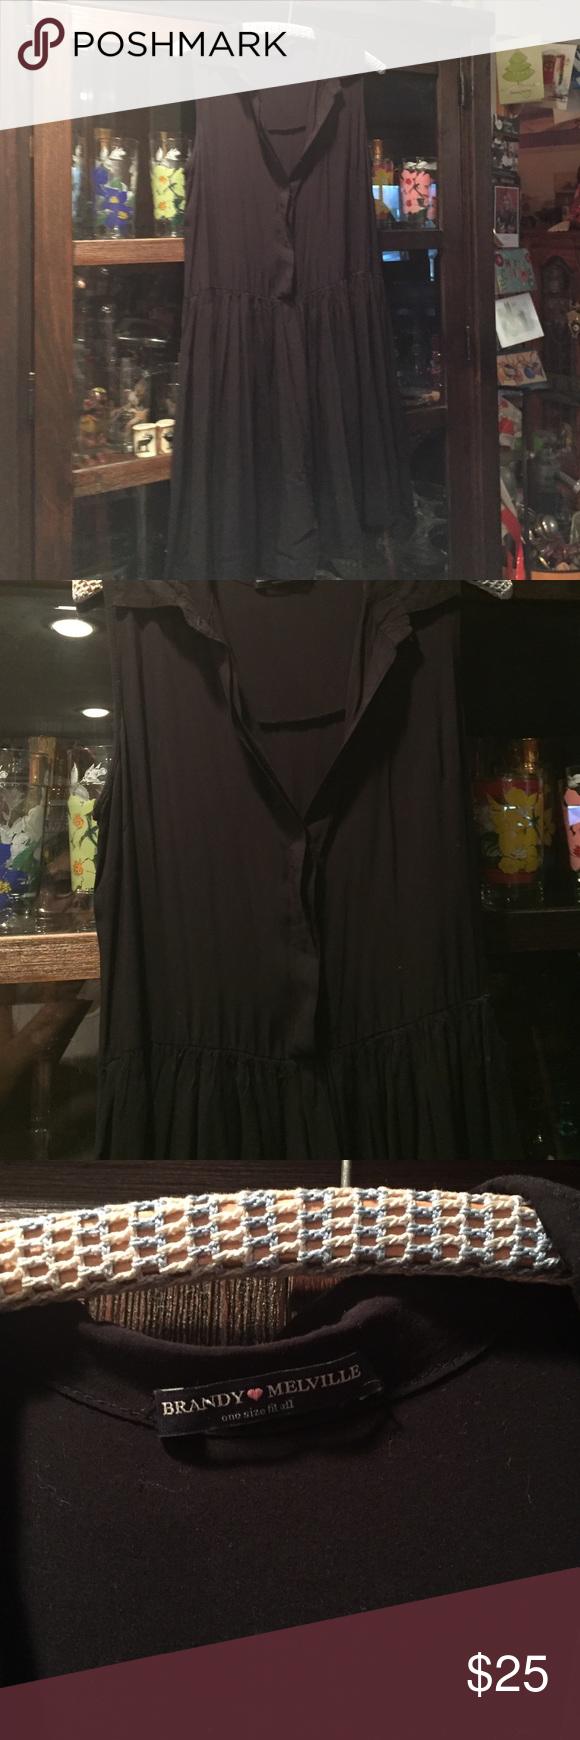 Brandy Melville black dress Brandy Melville Darling black dress one size Brandy Melville Dresses Mini